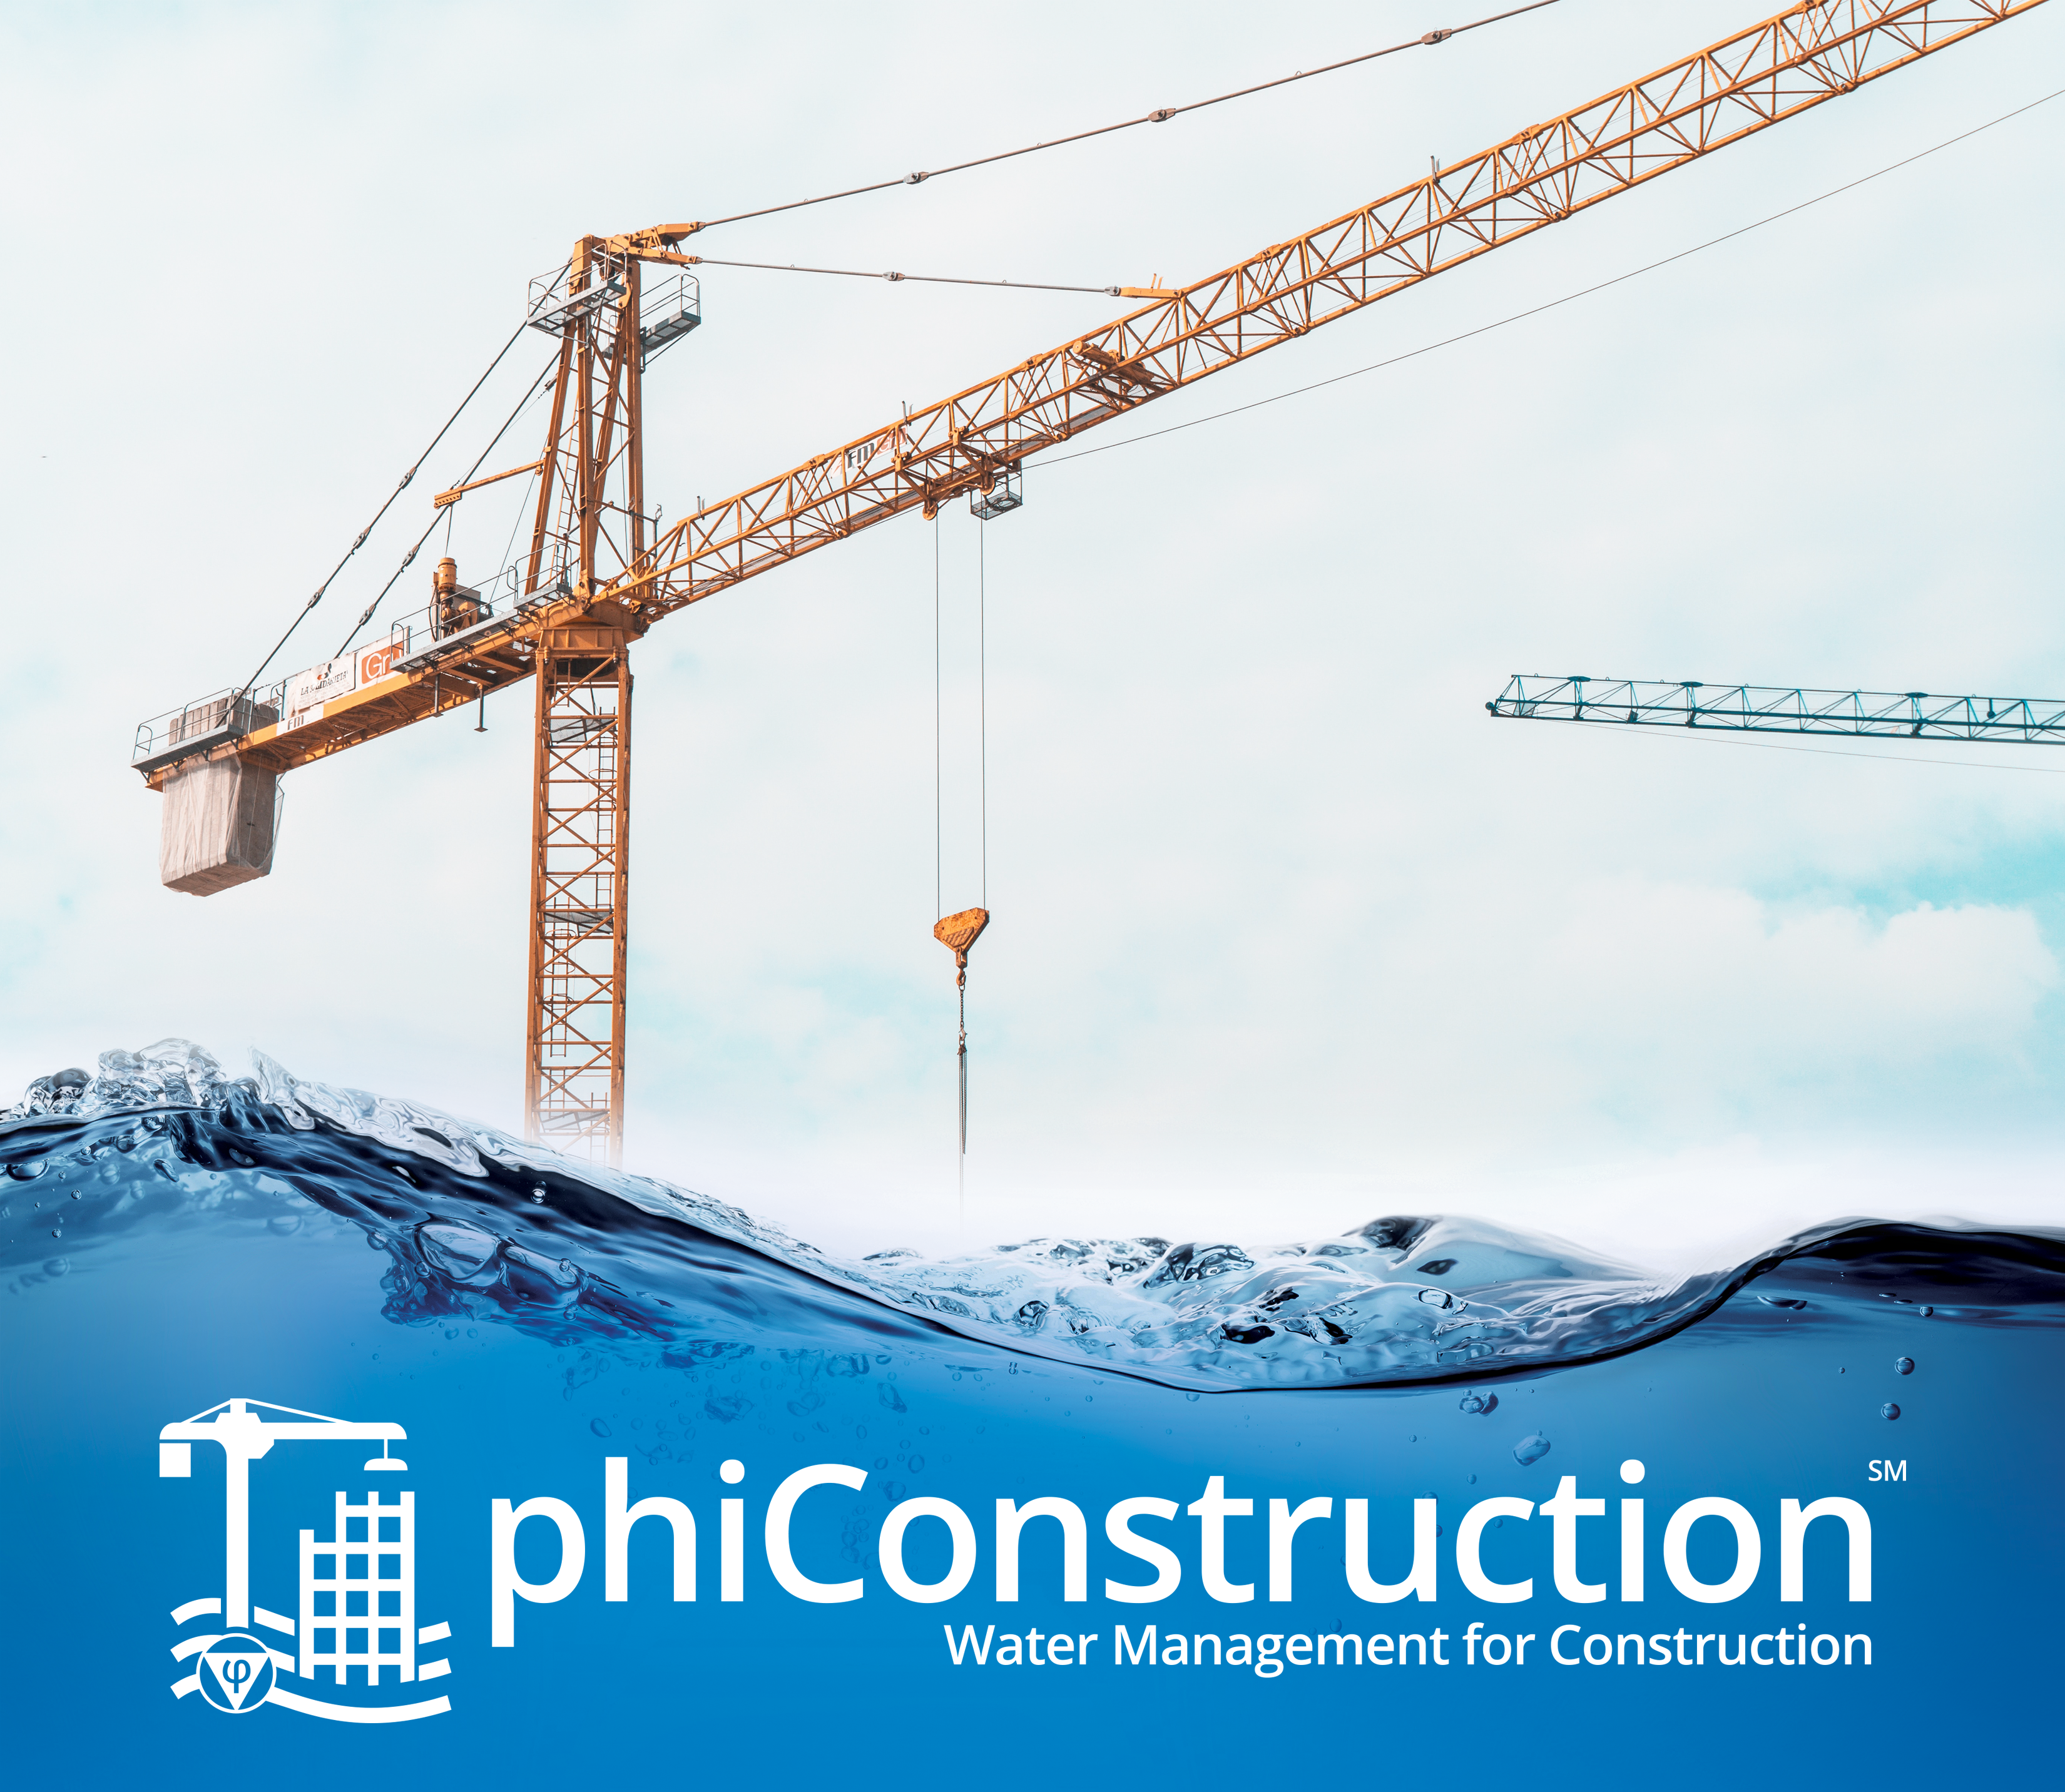 phiConstruction + logo (1)